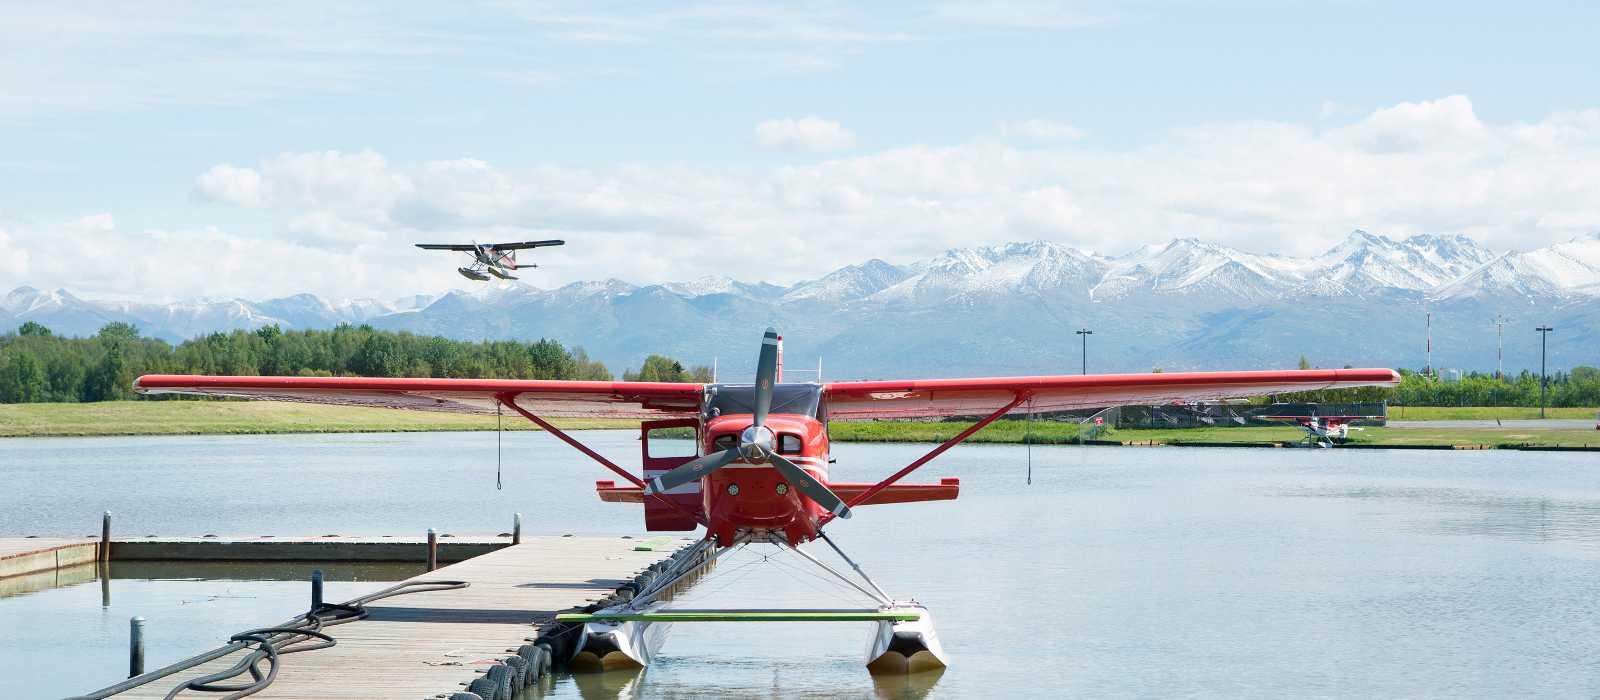 Sightseeing - Alaska